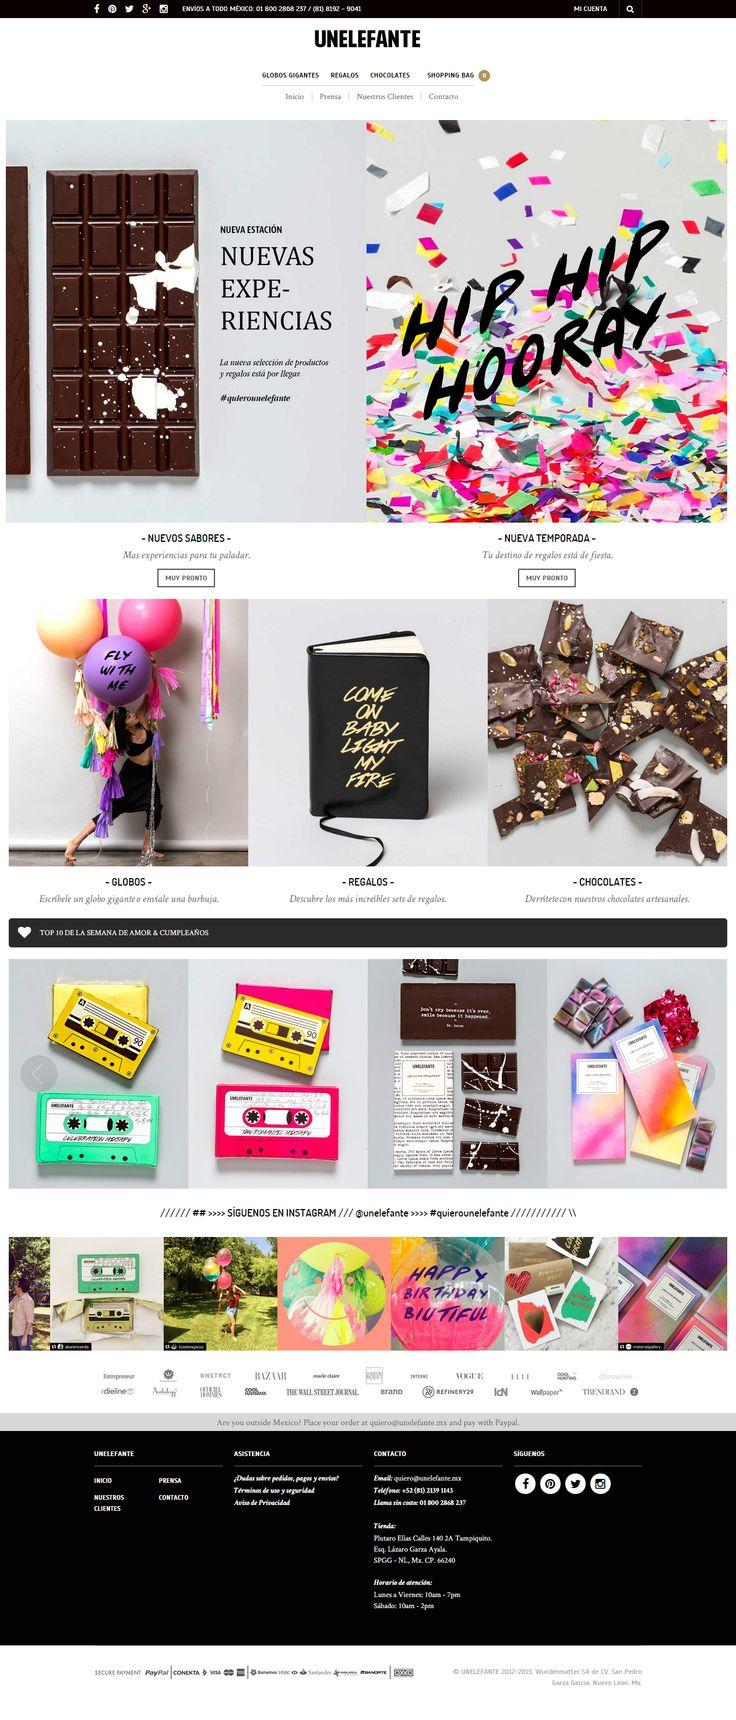 unelefante.mx was built using The Retailer WP Theme https://themeforest.net/item/the-retailer-responsive-wordpress-theme/4287447?utm_source=pinterest.com&utm_medium=social&utm_content=unelefante&utm_campaign=showcase  #wordpress #webdesign #onlineshop #gifts #chocolate